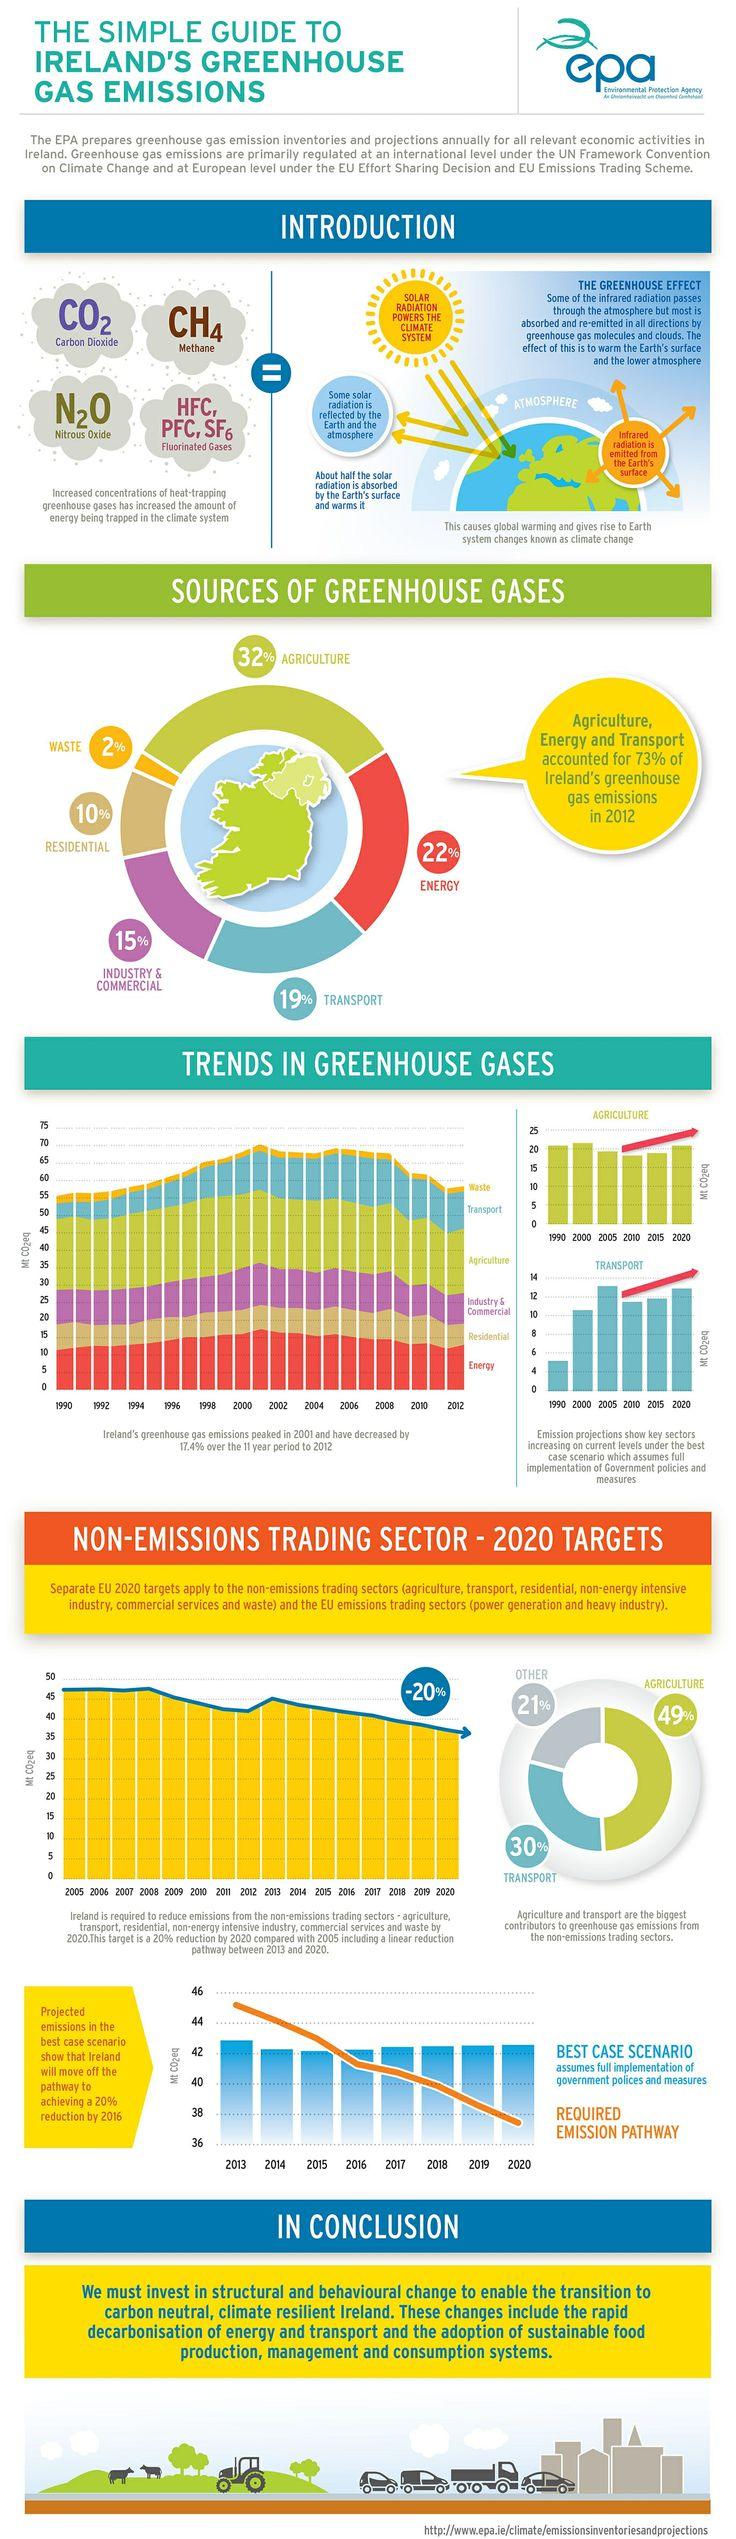 Ireland's Greenhouse Gas Emisisons